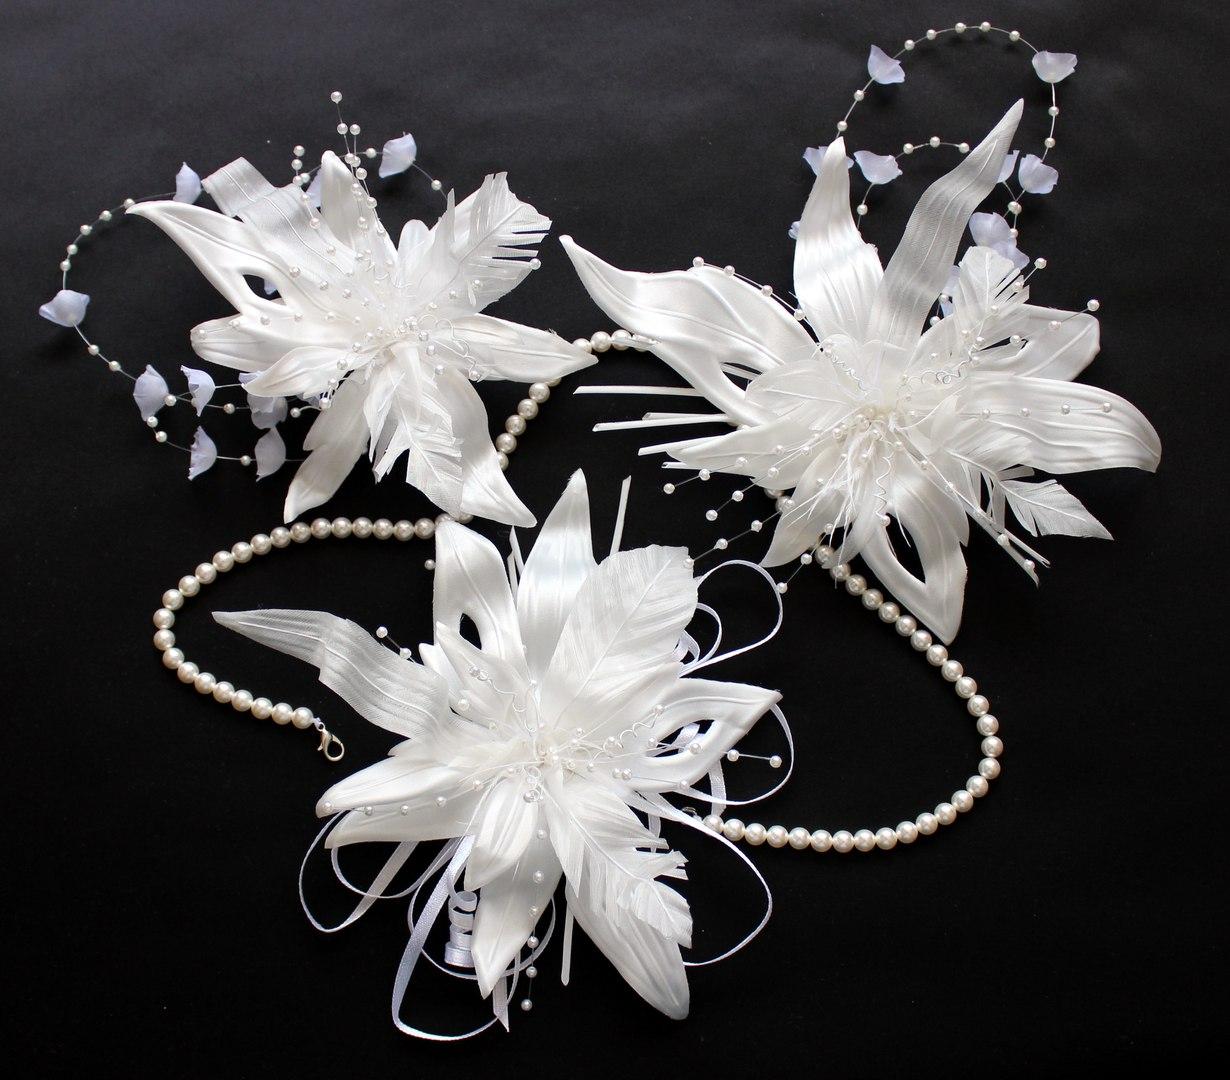 silk-flowers-nazarova-00025